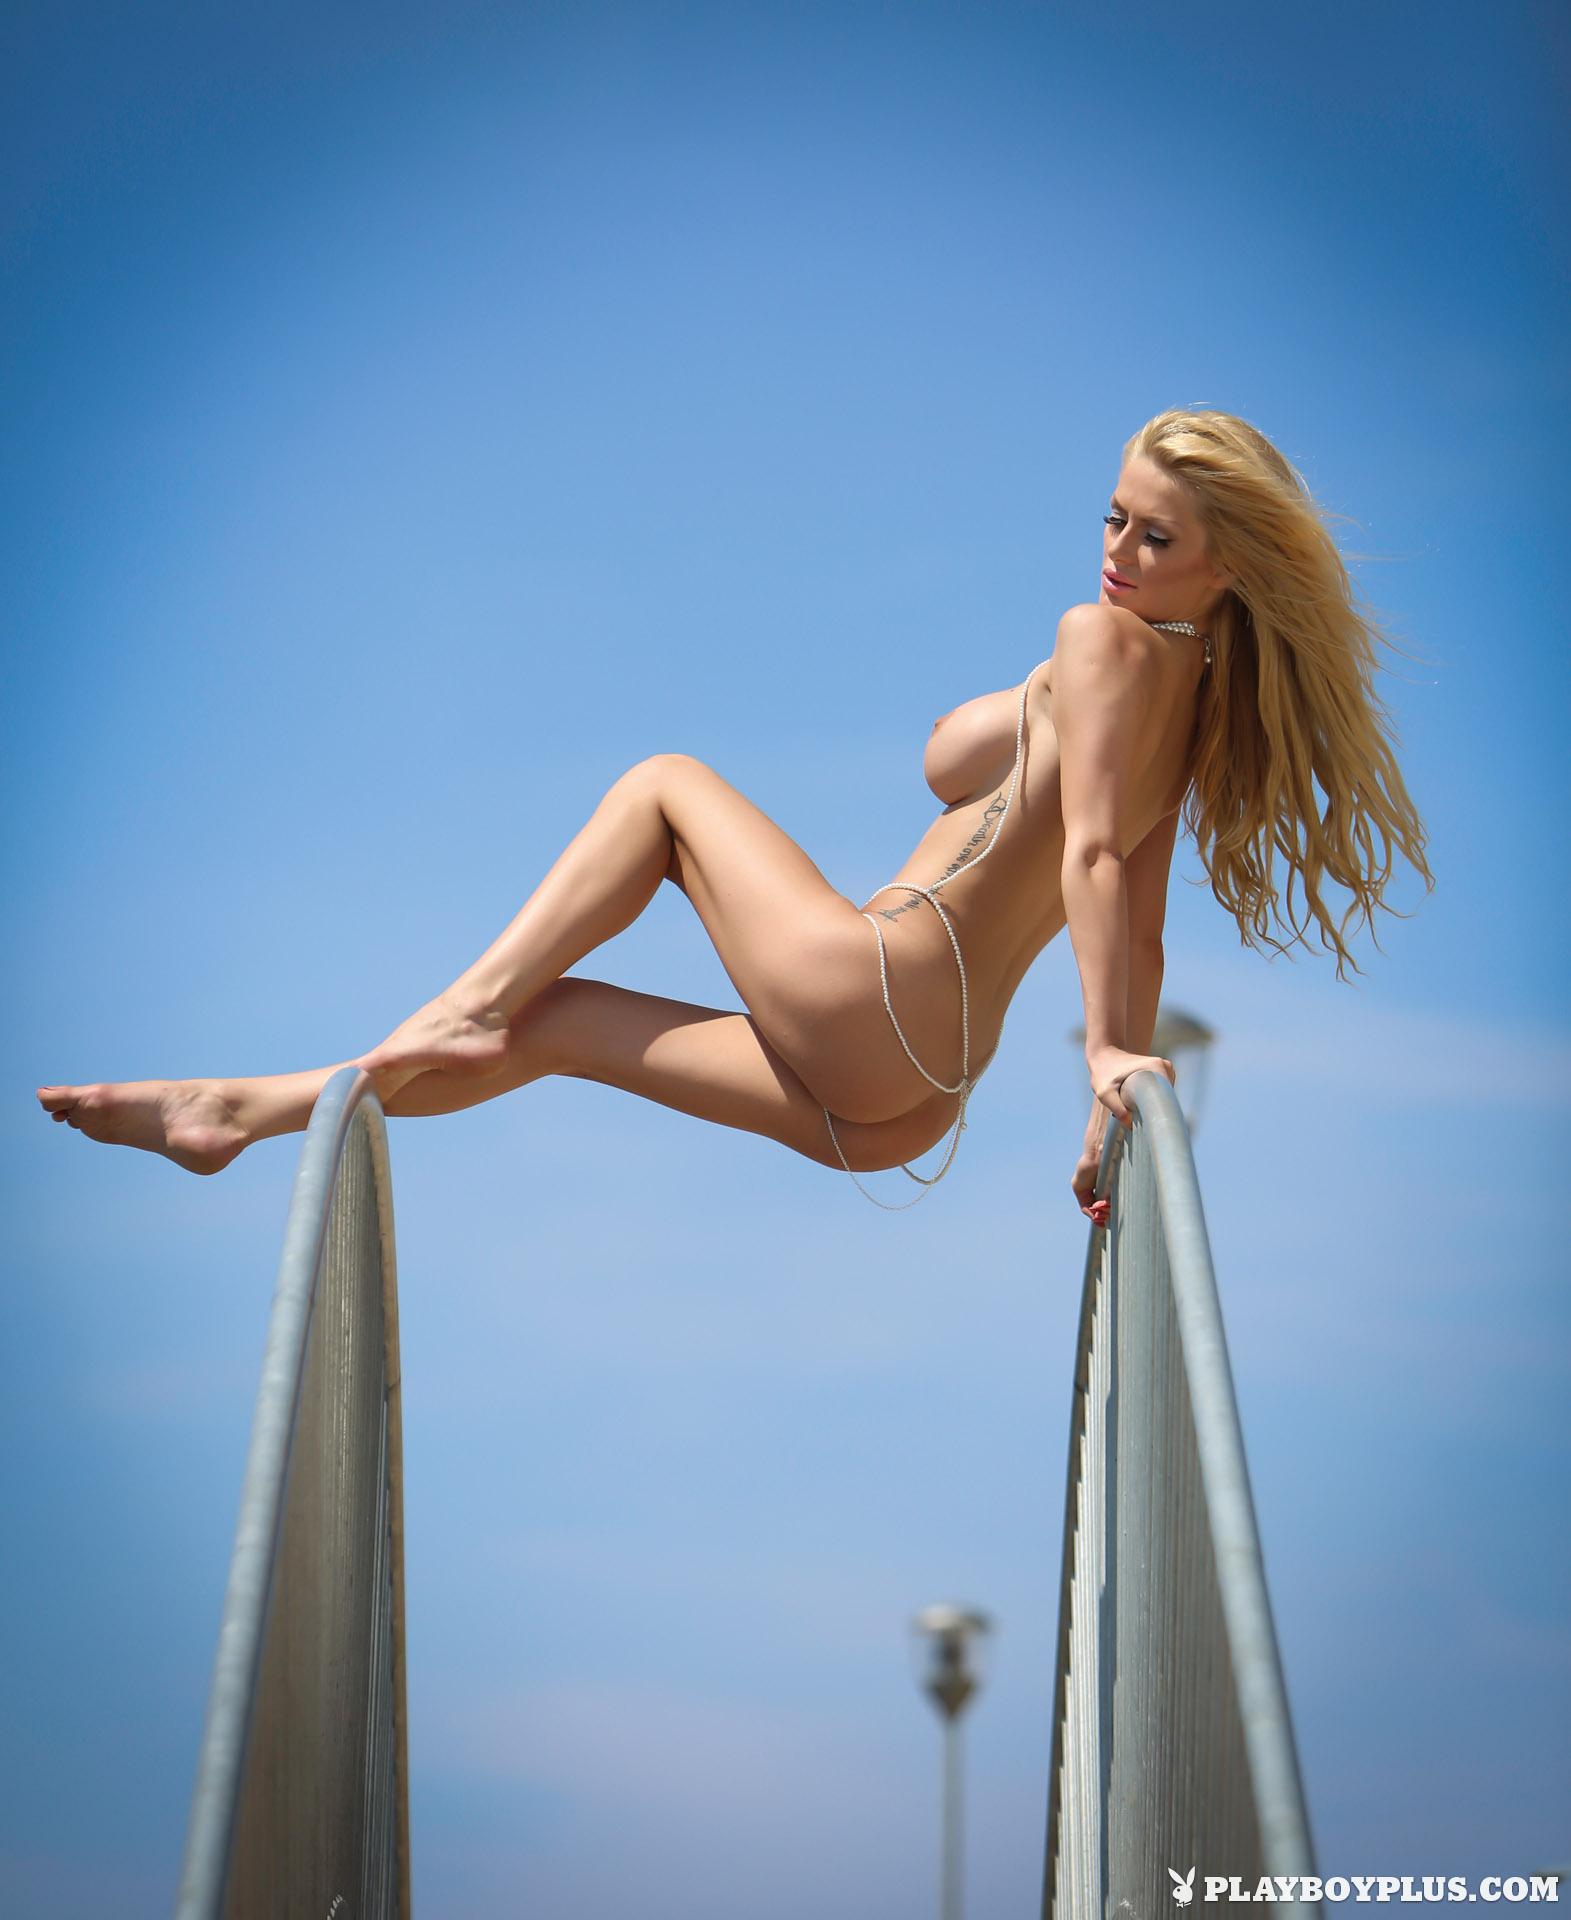 bozana-vujinovic-nude-boobs-blonde-croatia-playboy-10